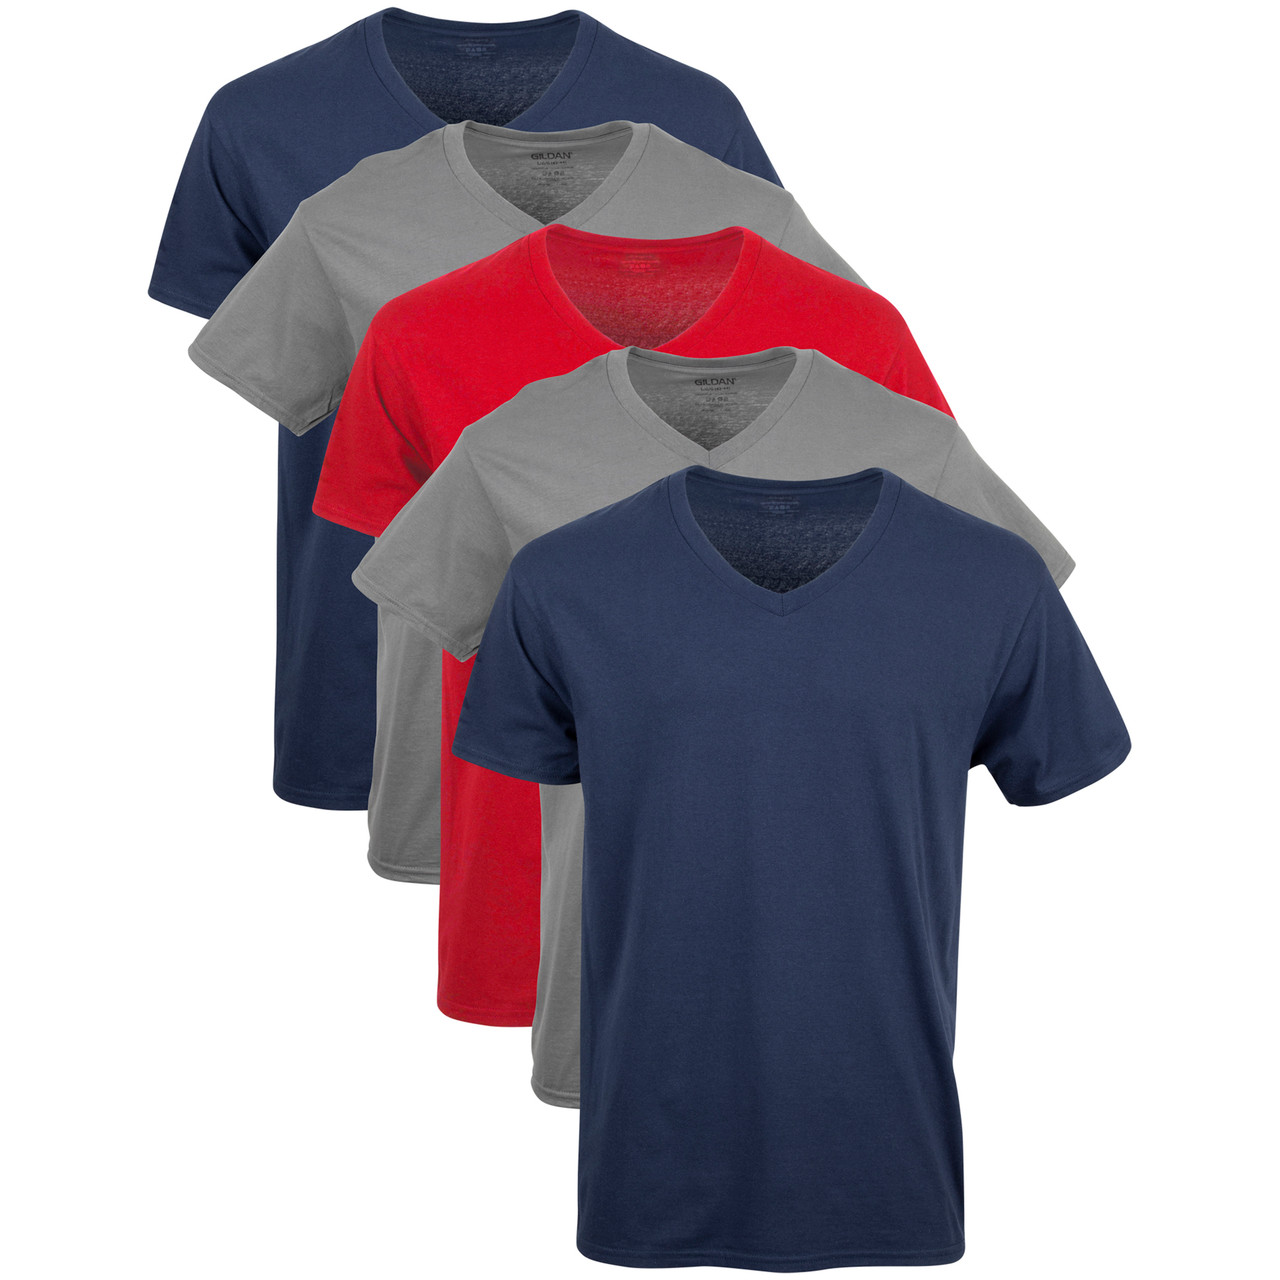 Royal MENS PREMIUM V NECK T-SHIRT Gildan 100/% Cotton Plain T SHIRT